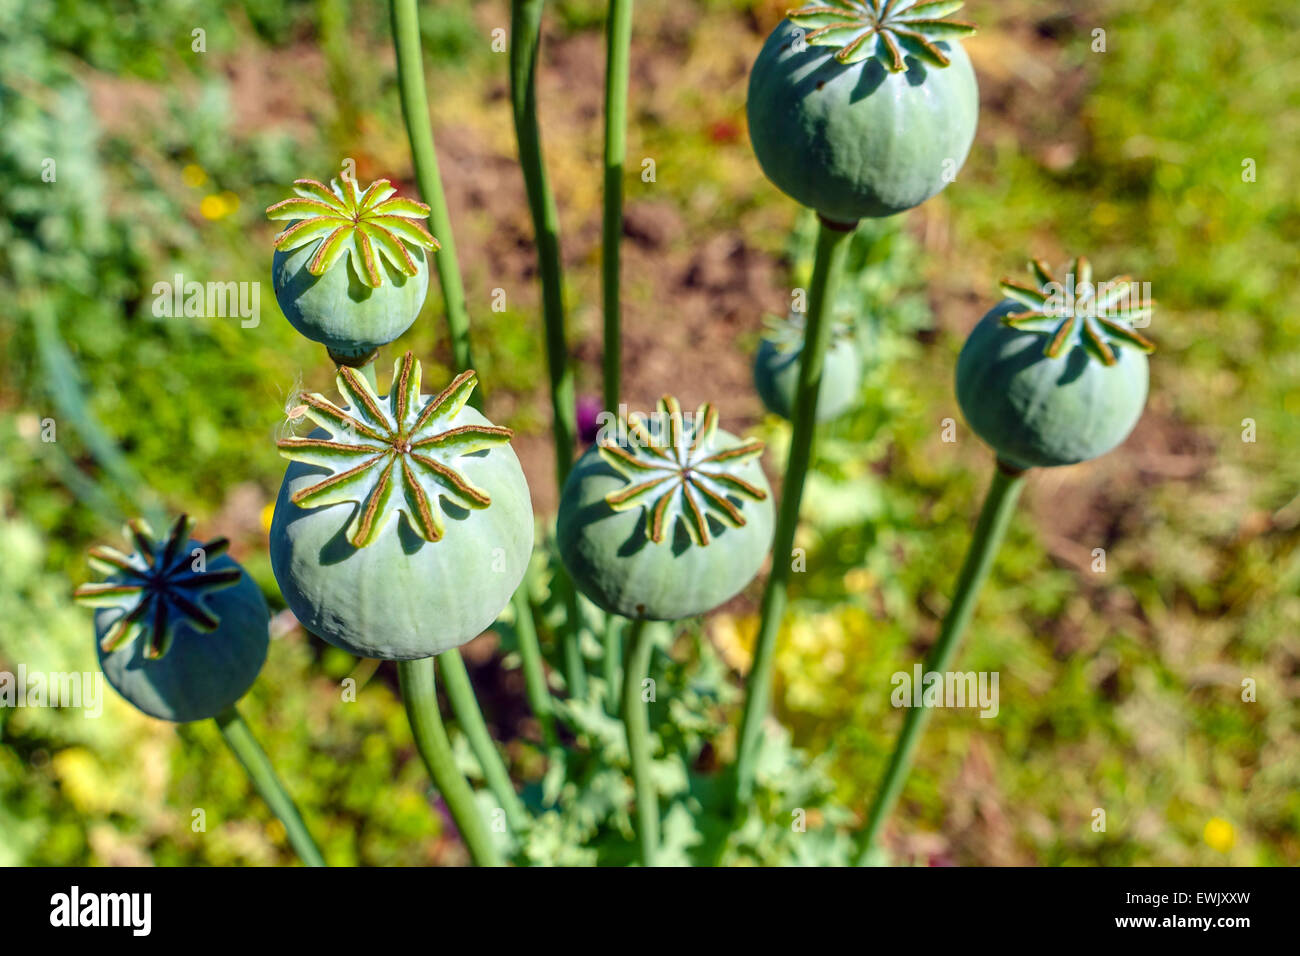 Poppy Seed Heads Opium Drugs Stock Photos Poppy Seed Heads Opium